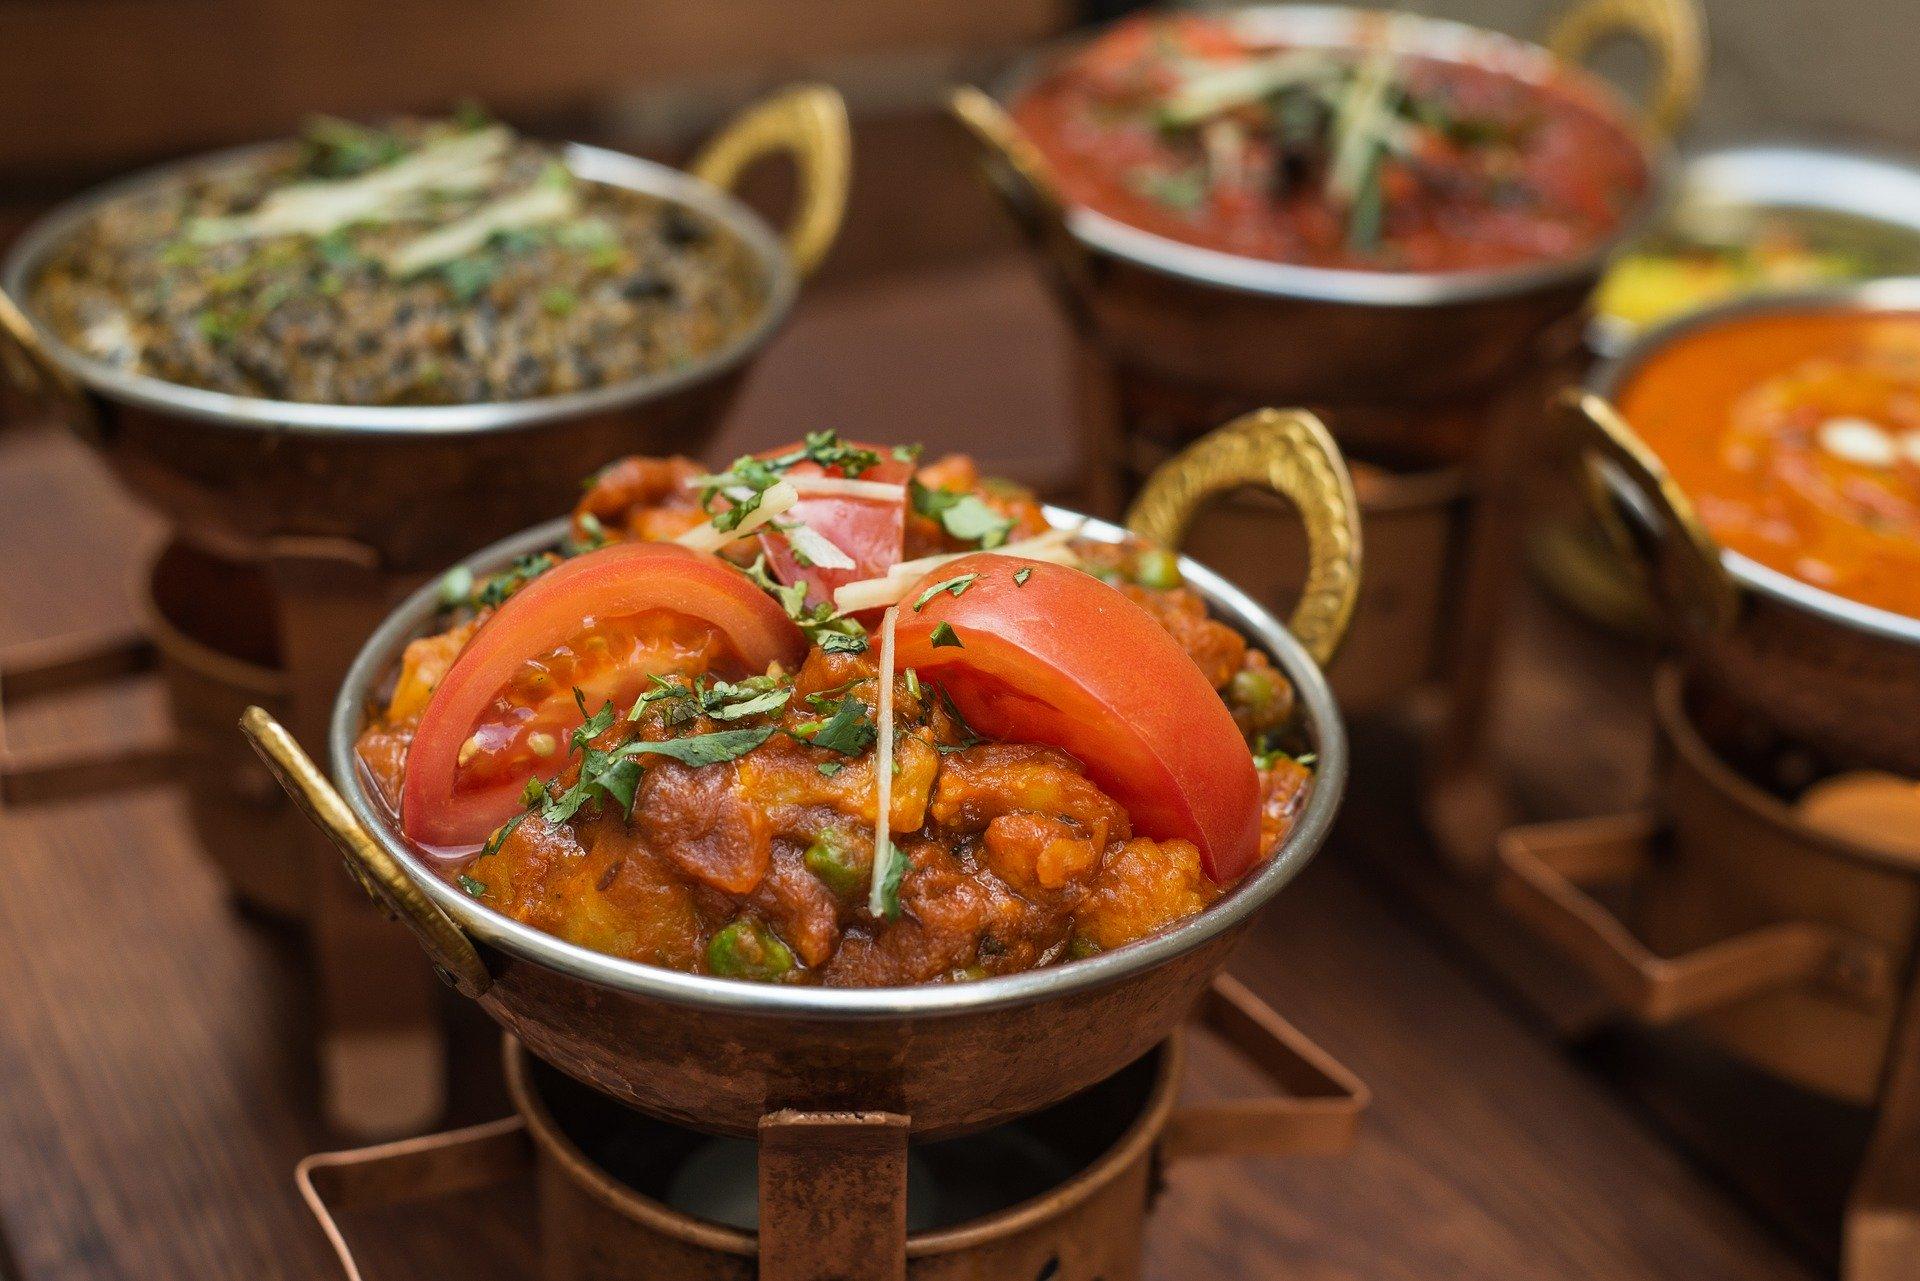 indian-food-3856050_1920